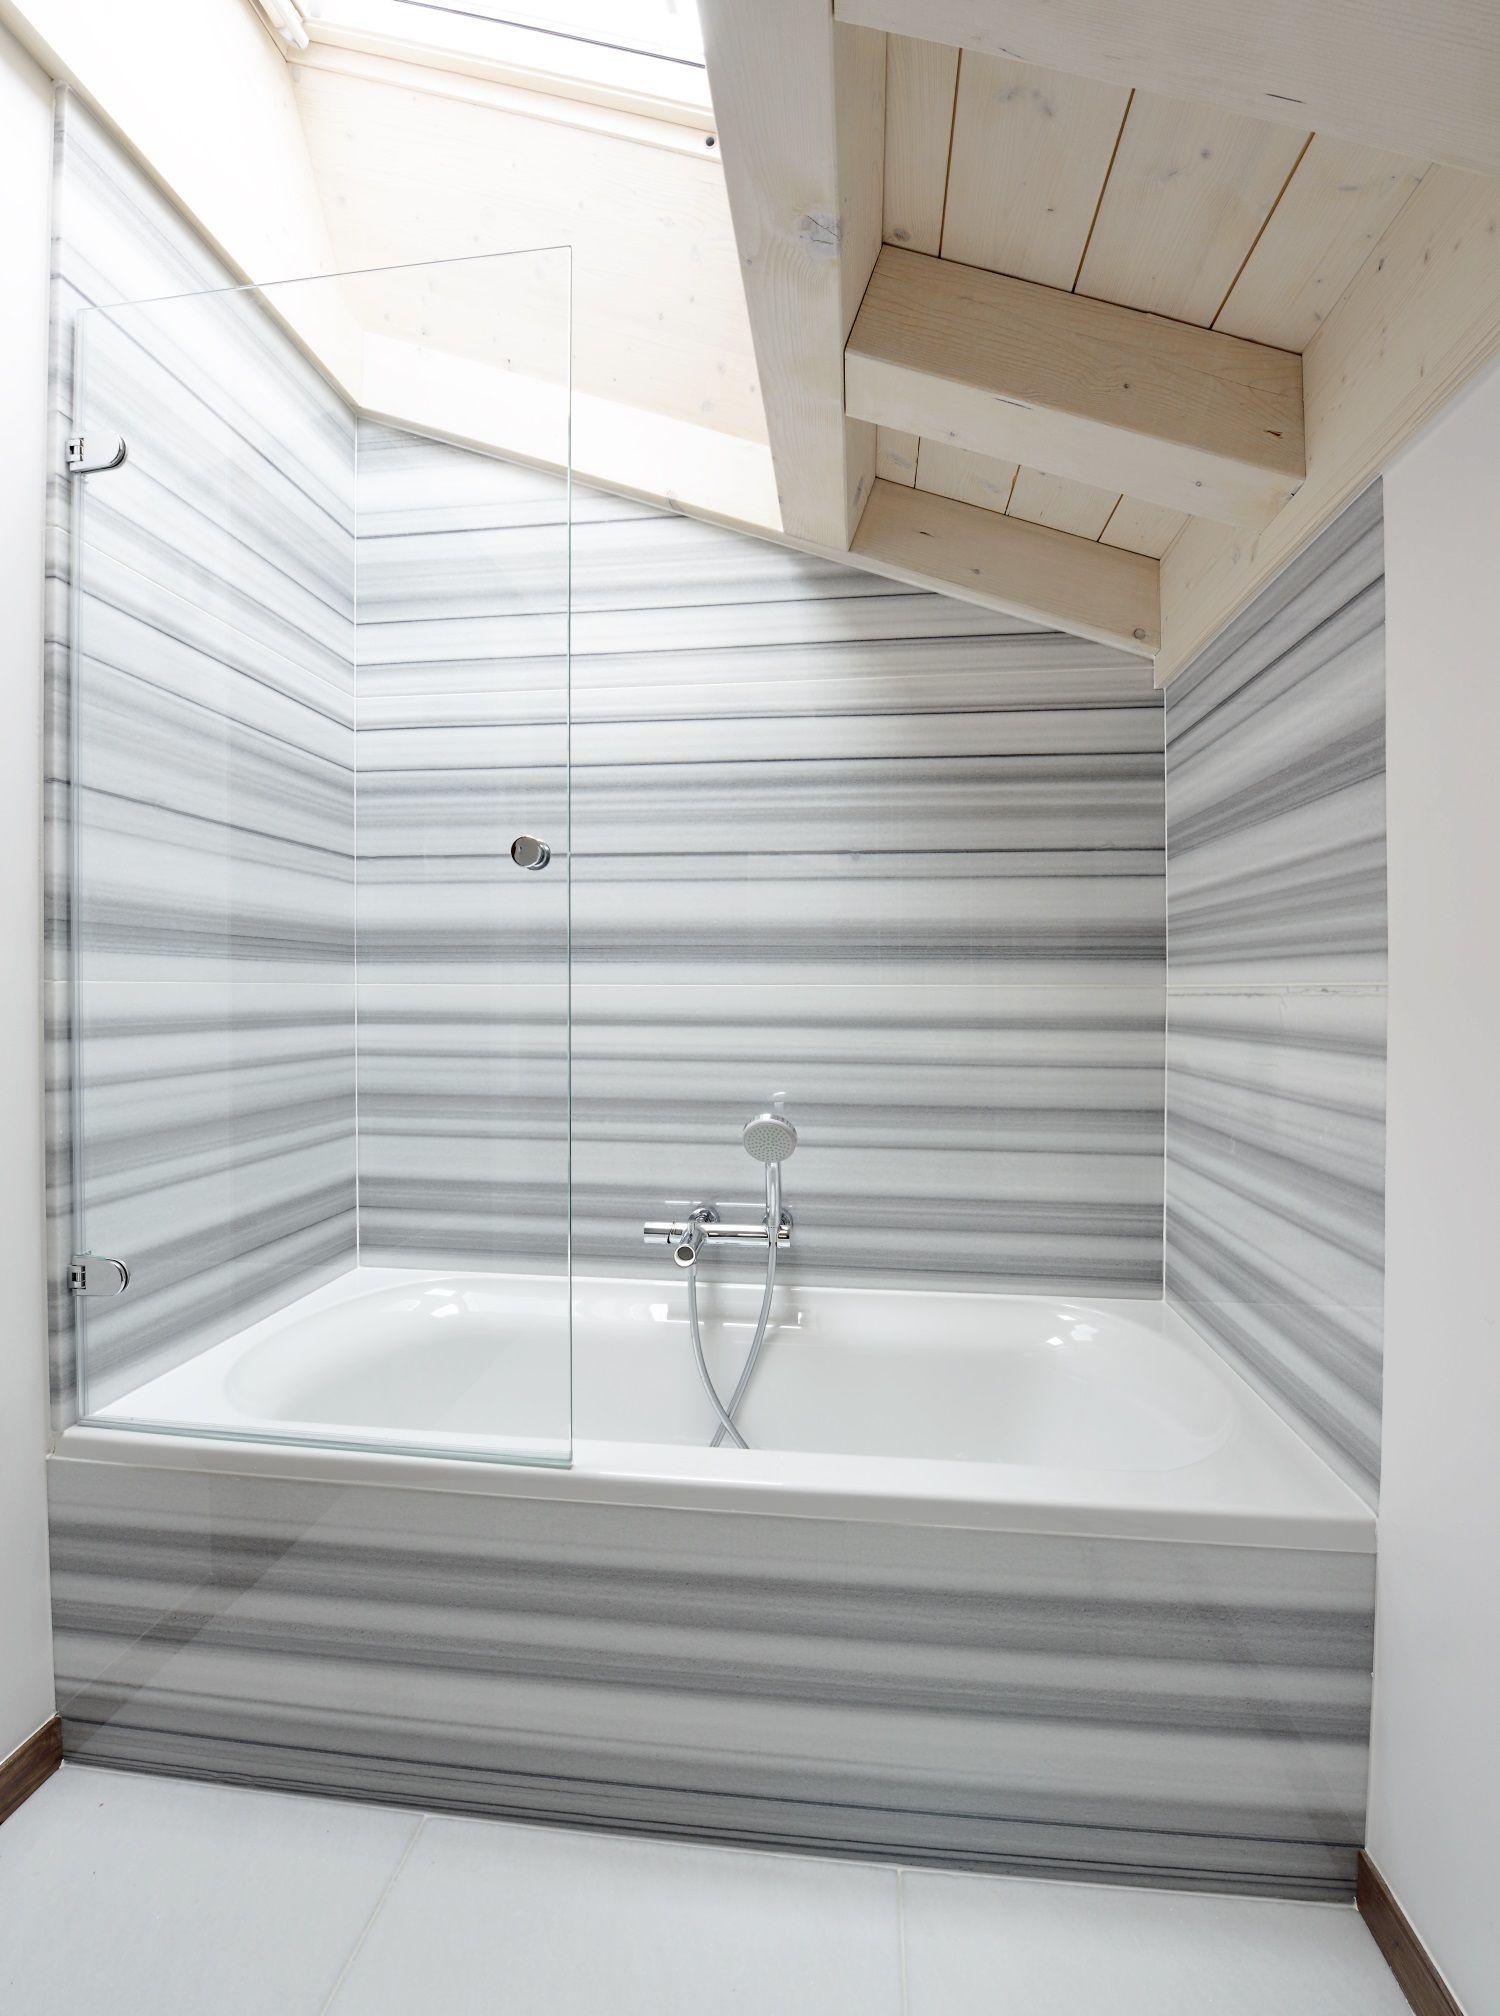 Salle de bain: Dallage sur mesure en pierre naturelle mabre medina ...